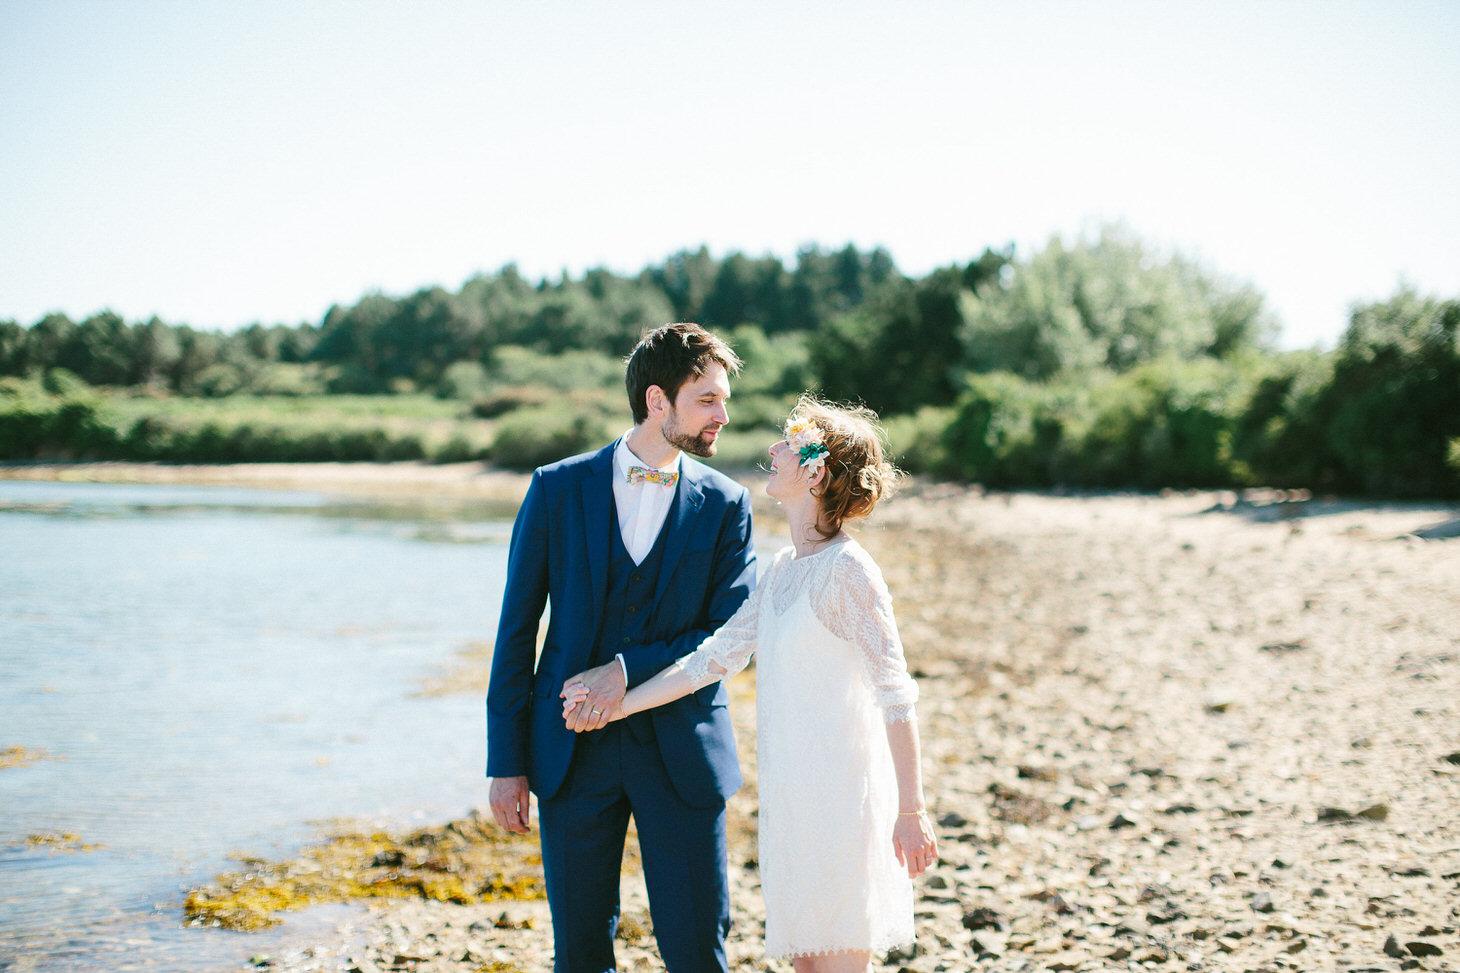 photographe-mariage-arz-morbihan-bretagne-056